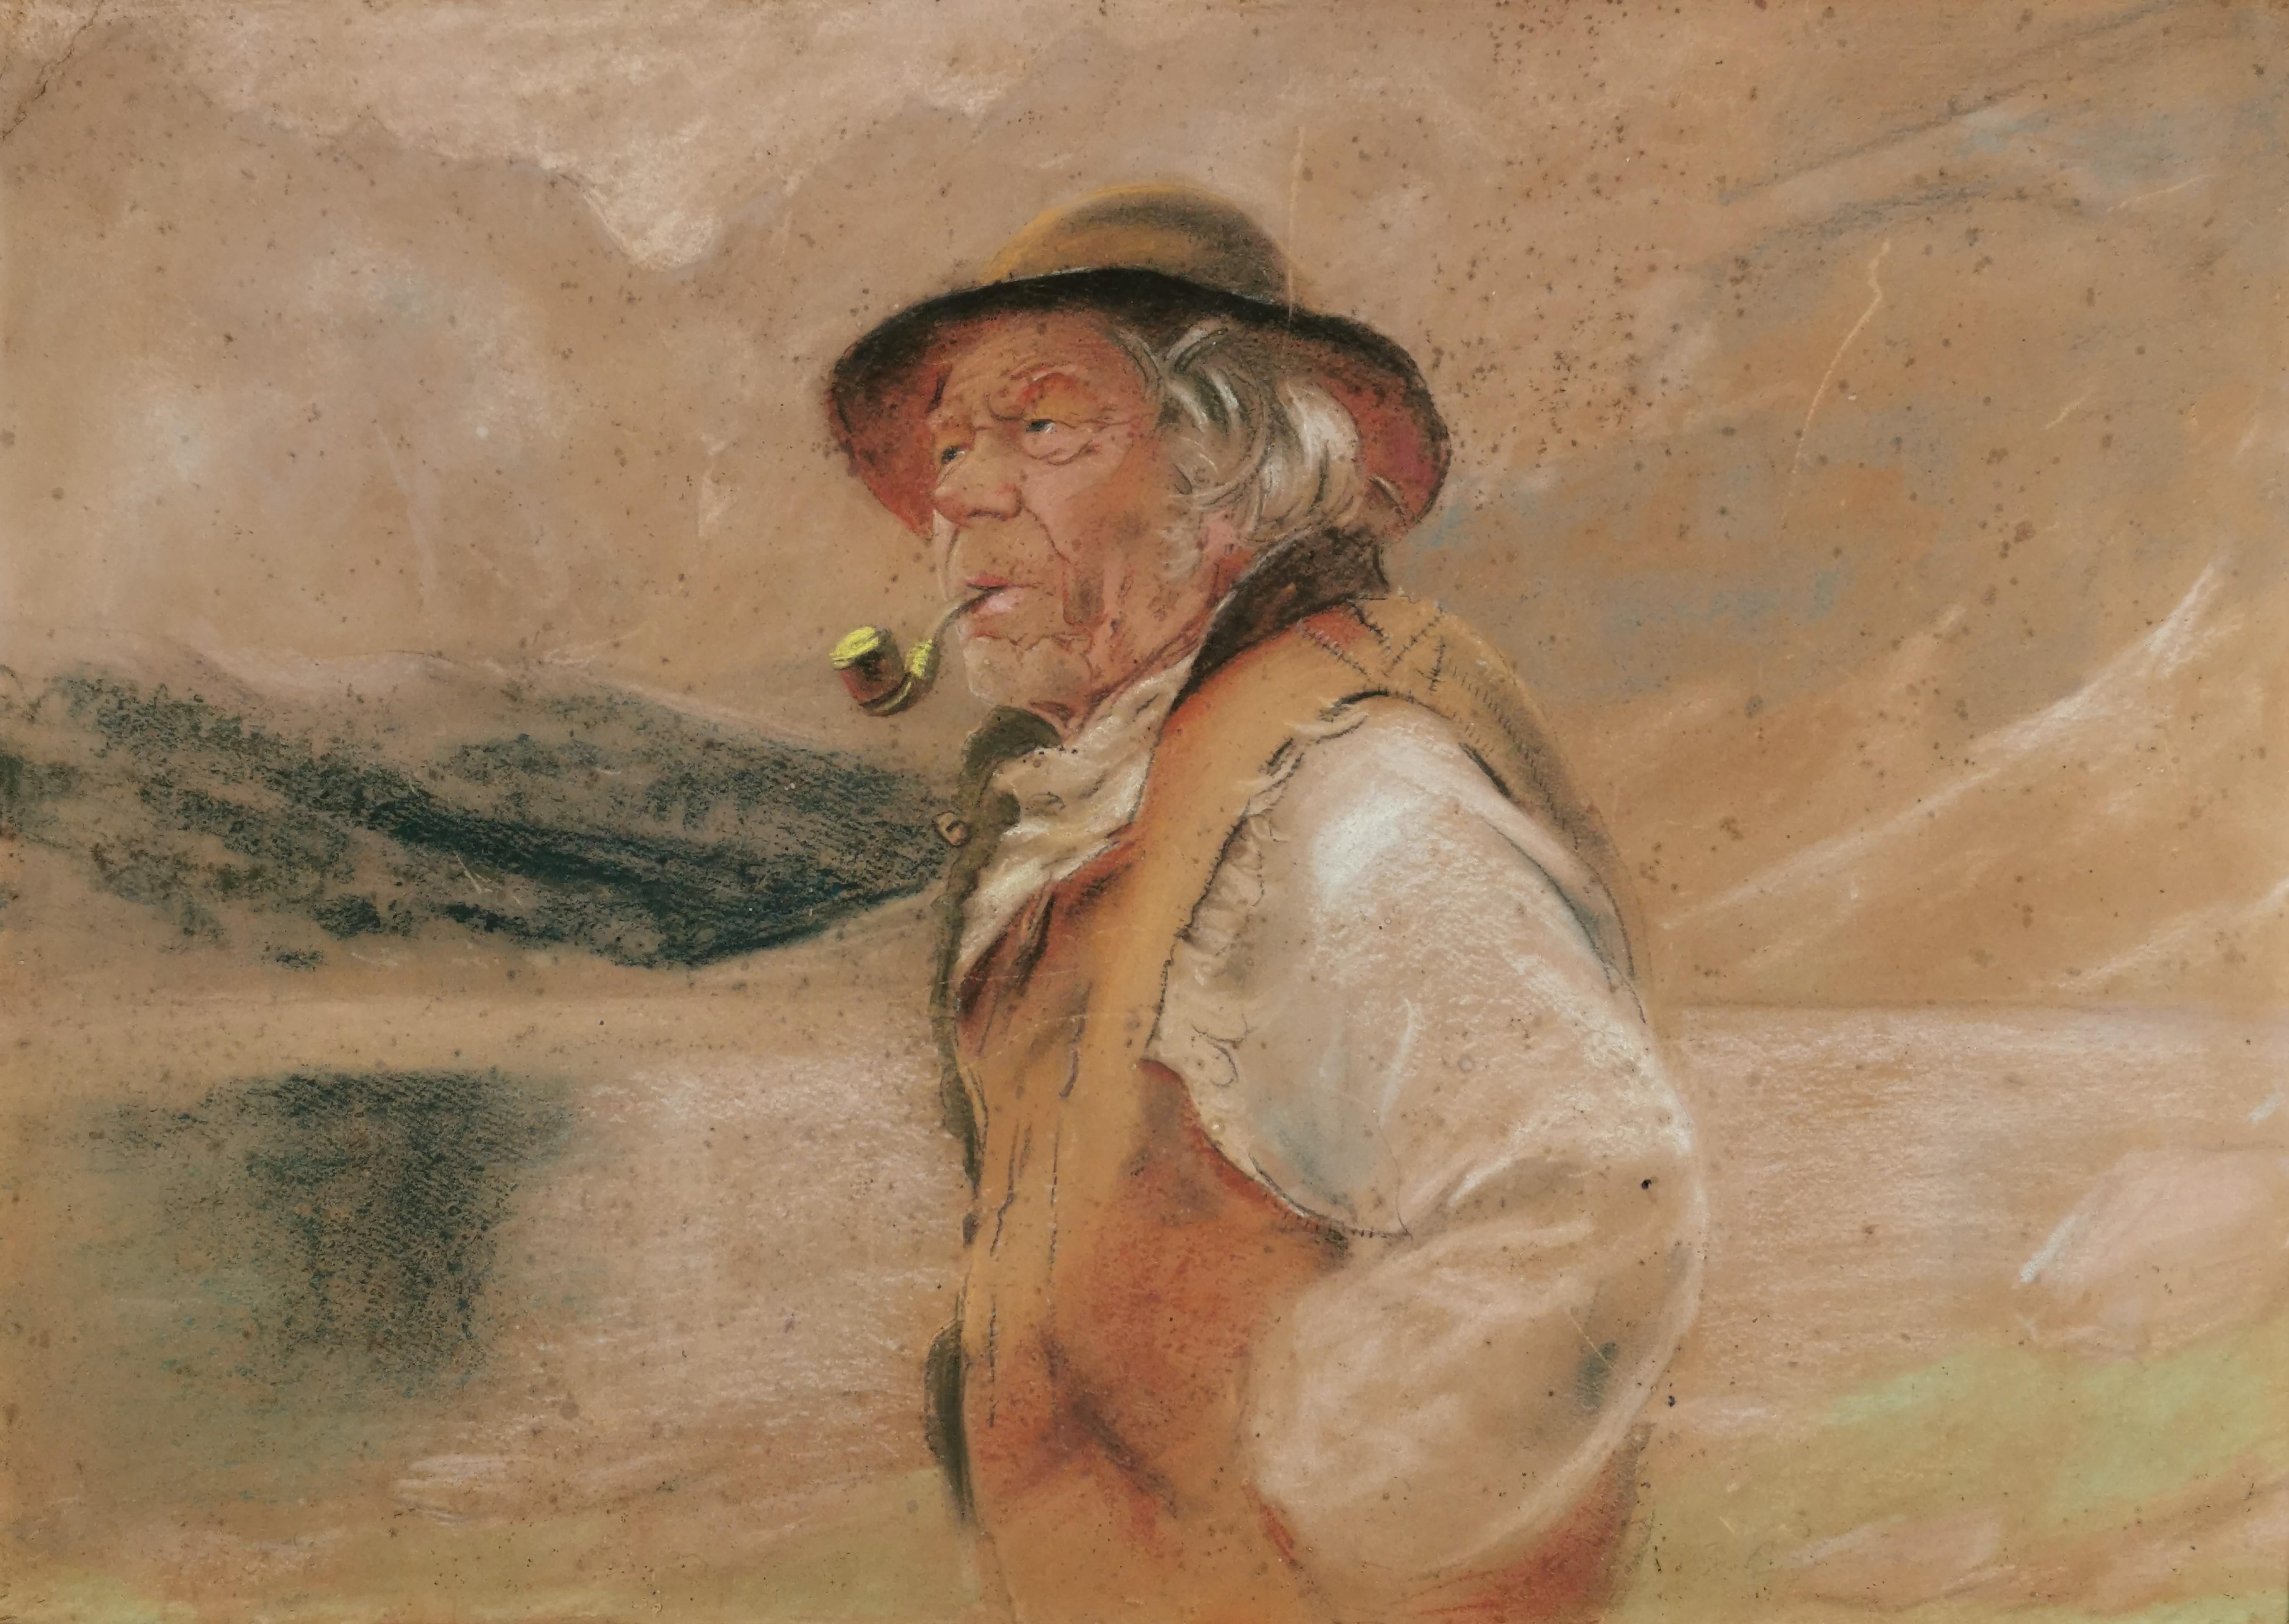 Stary Józwa